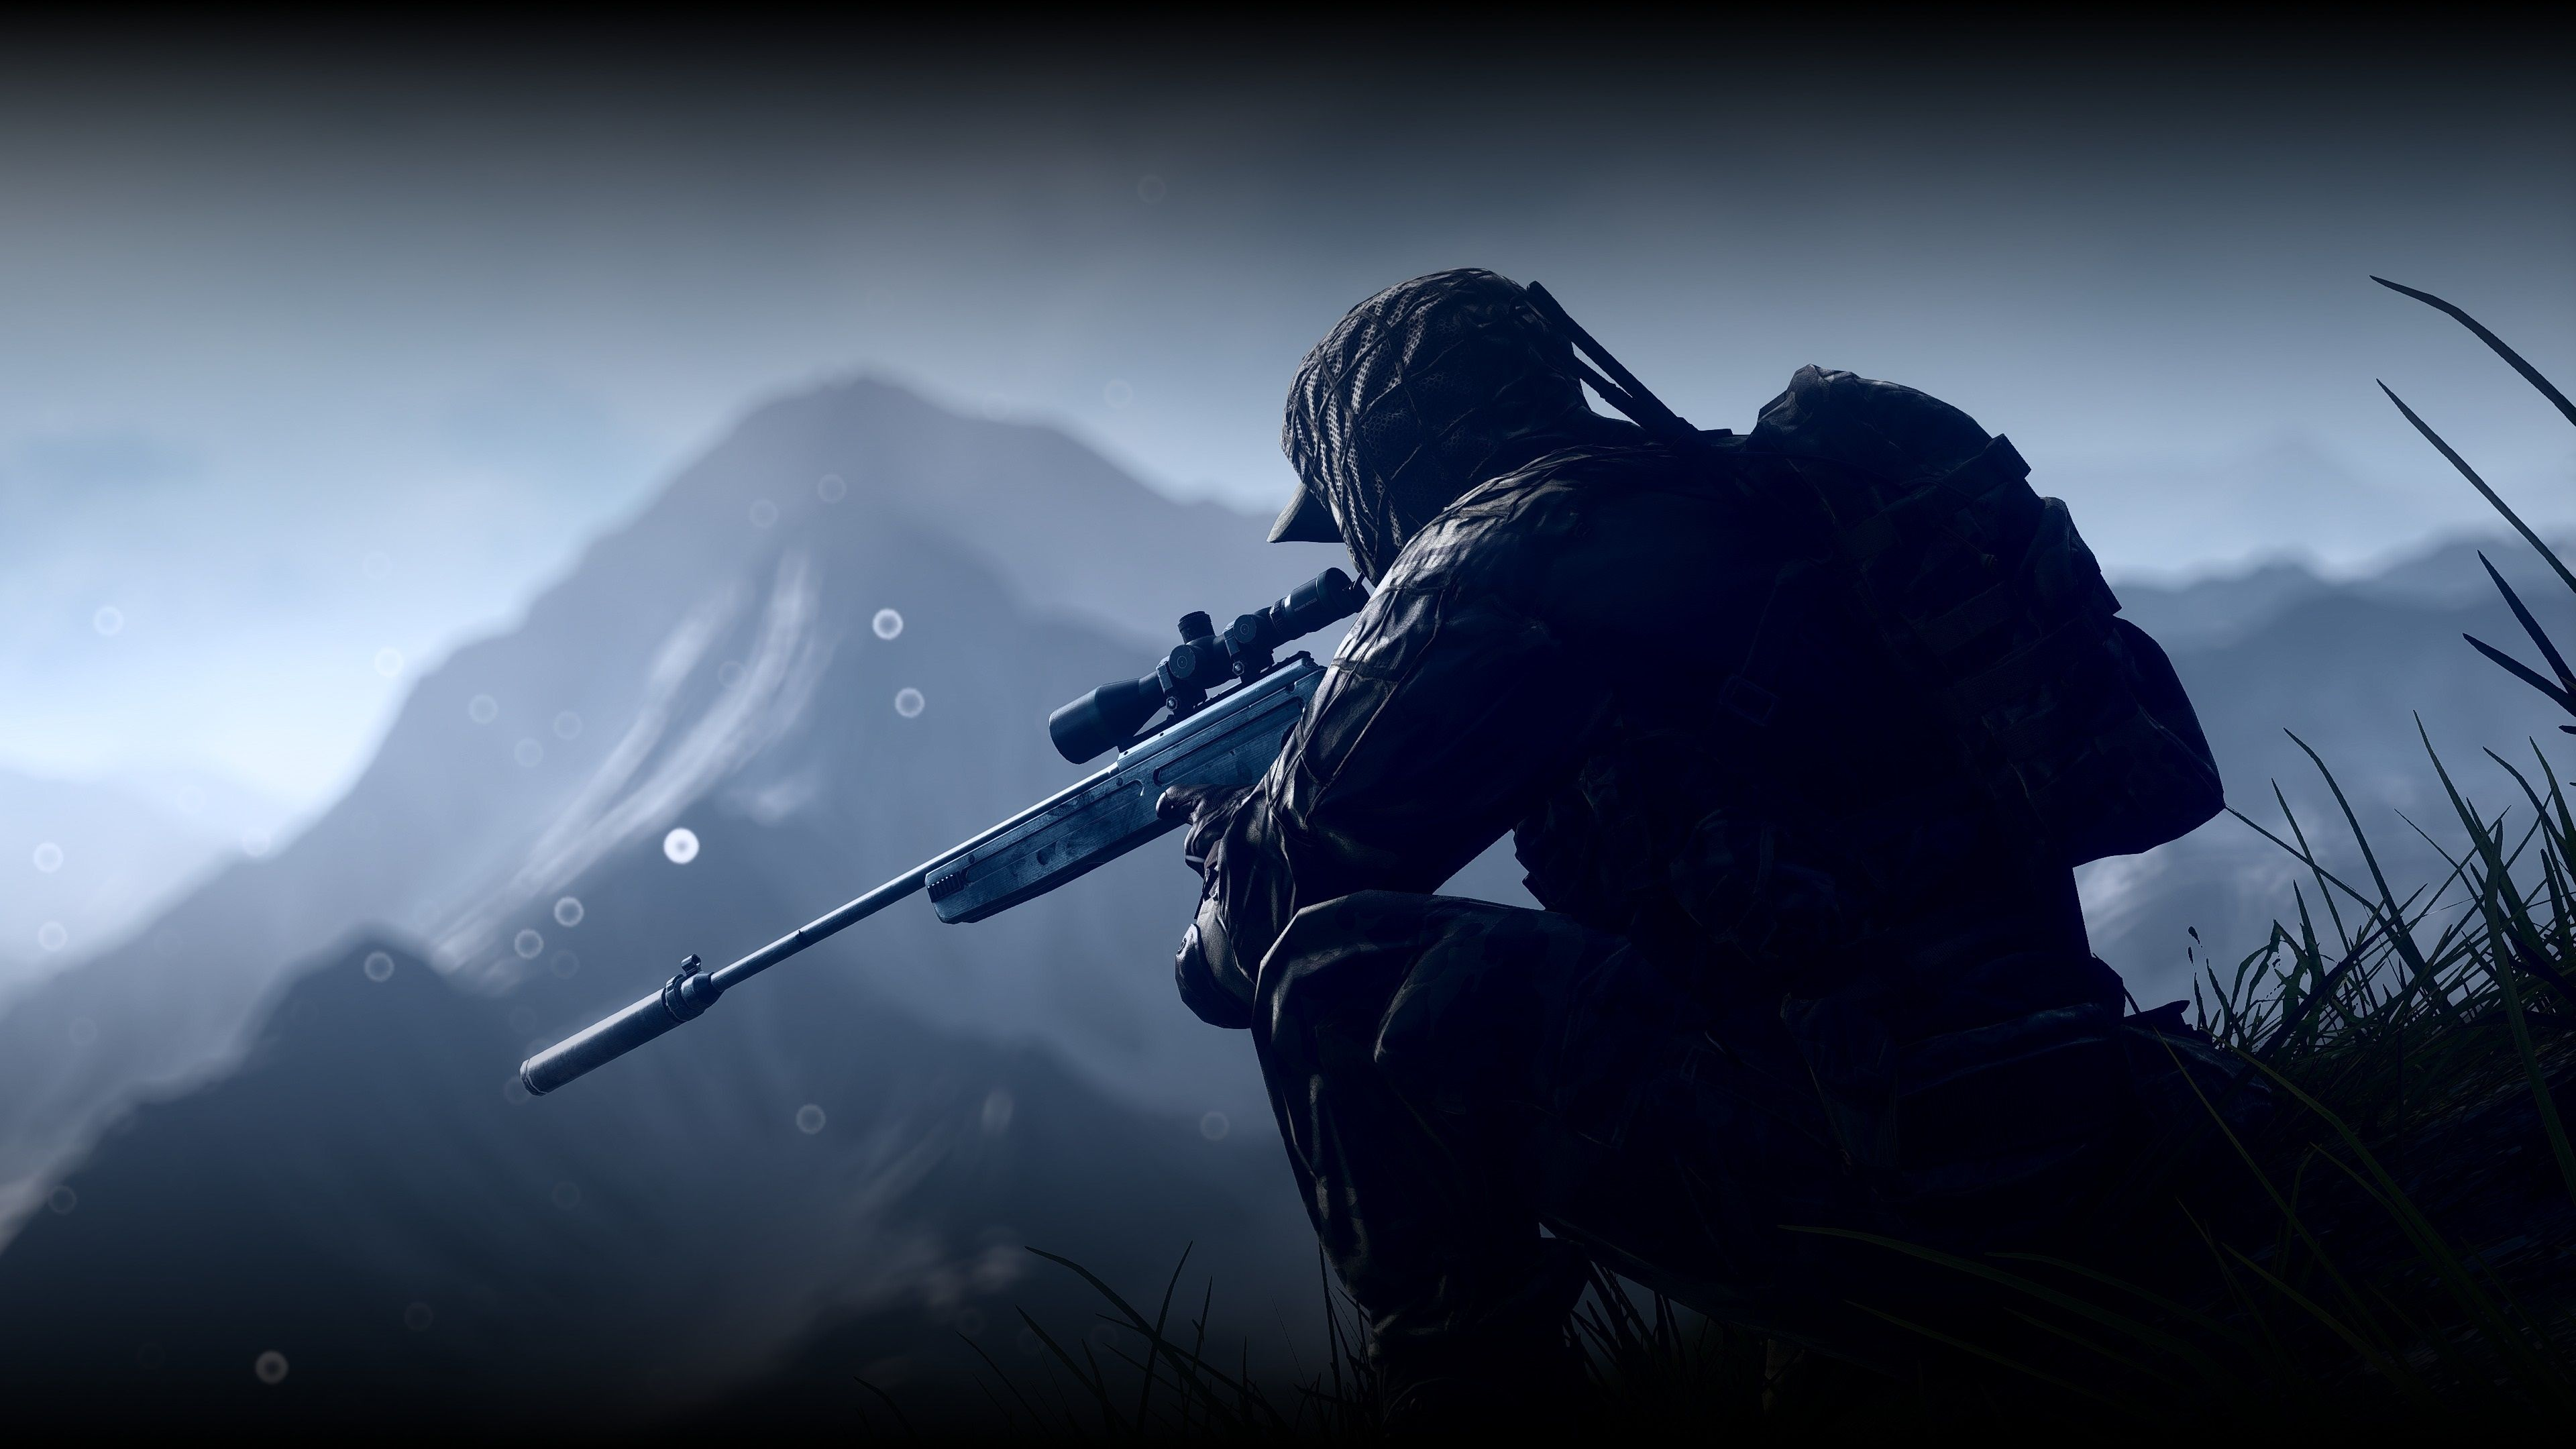 4k Sniper Wallpapers Top Free 4k Sniper Backgrounds